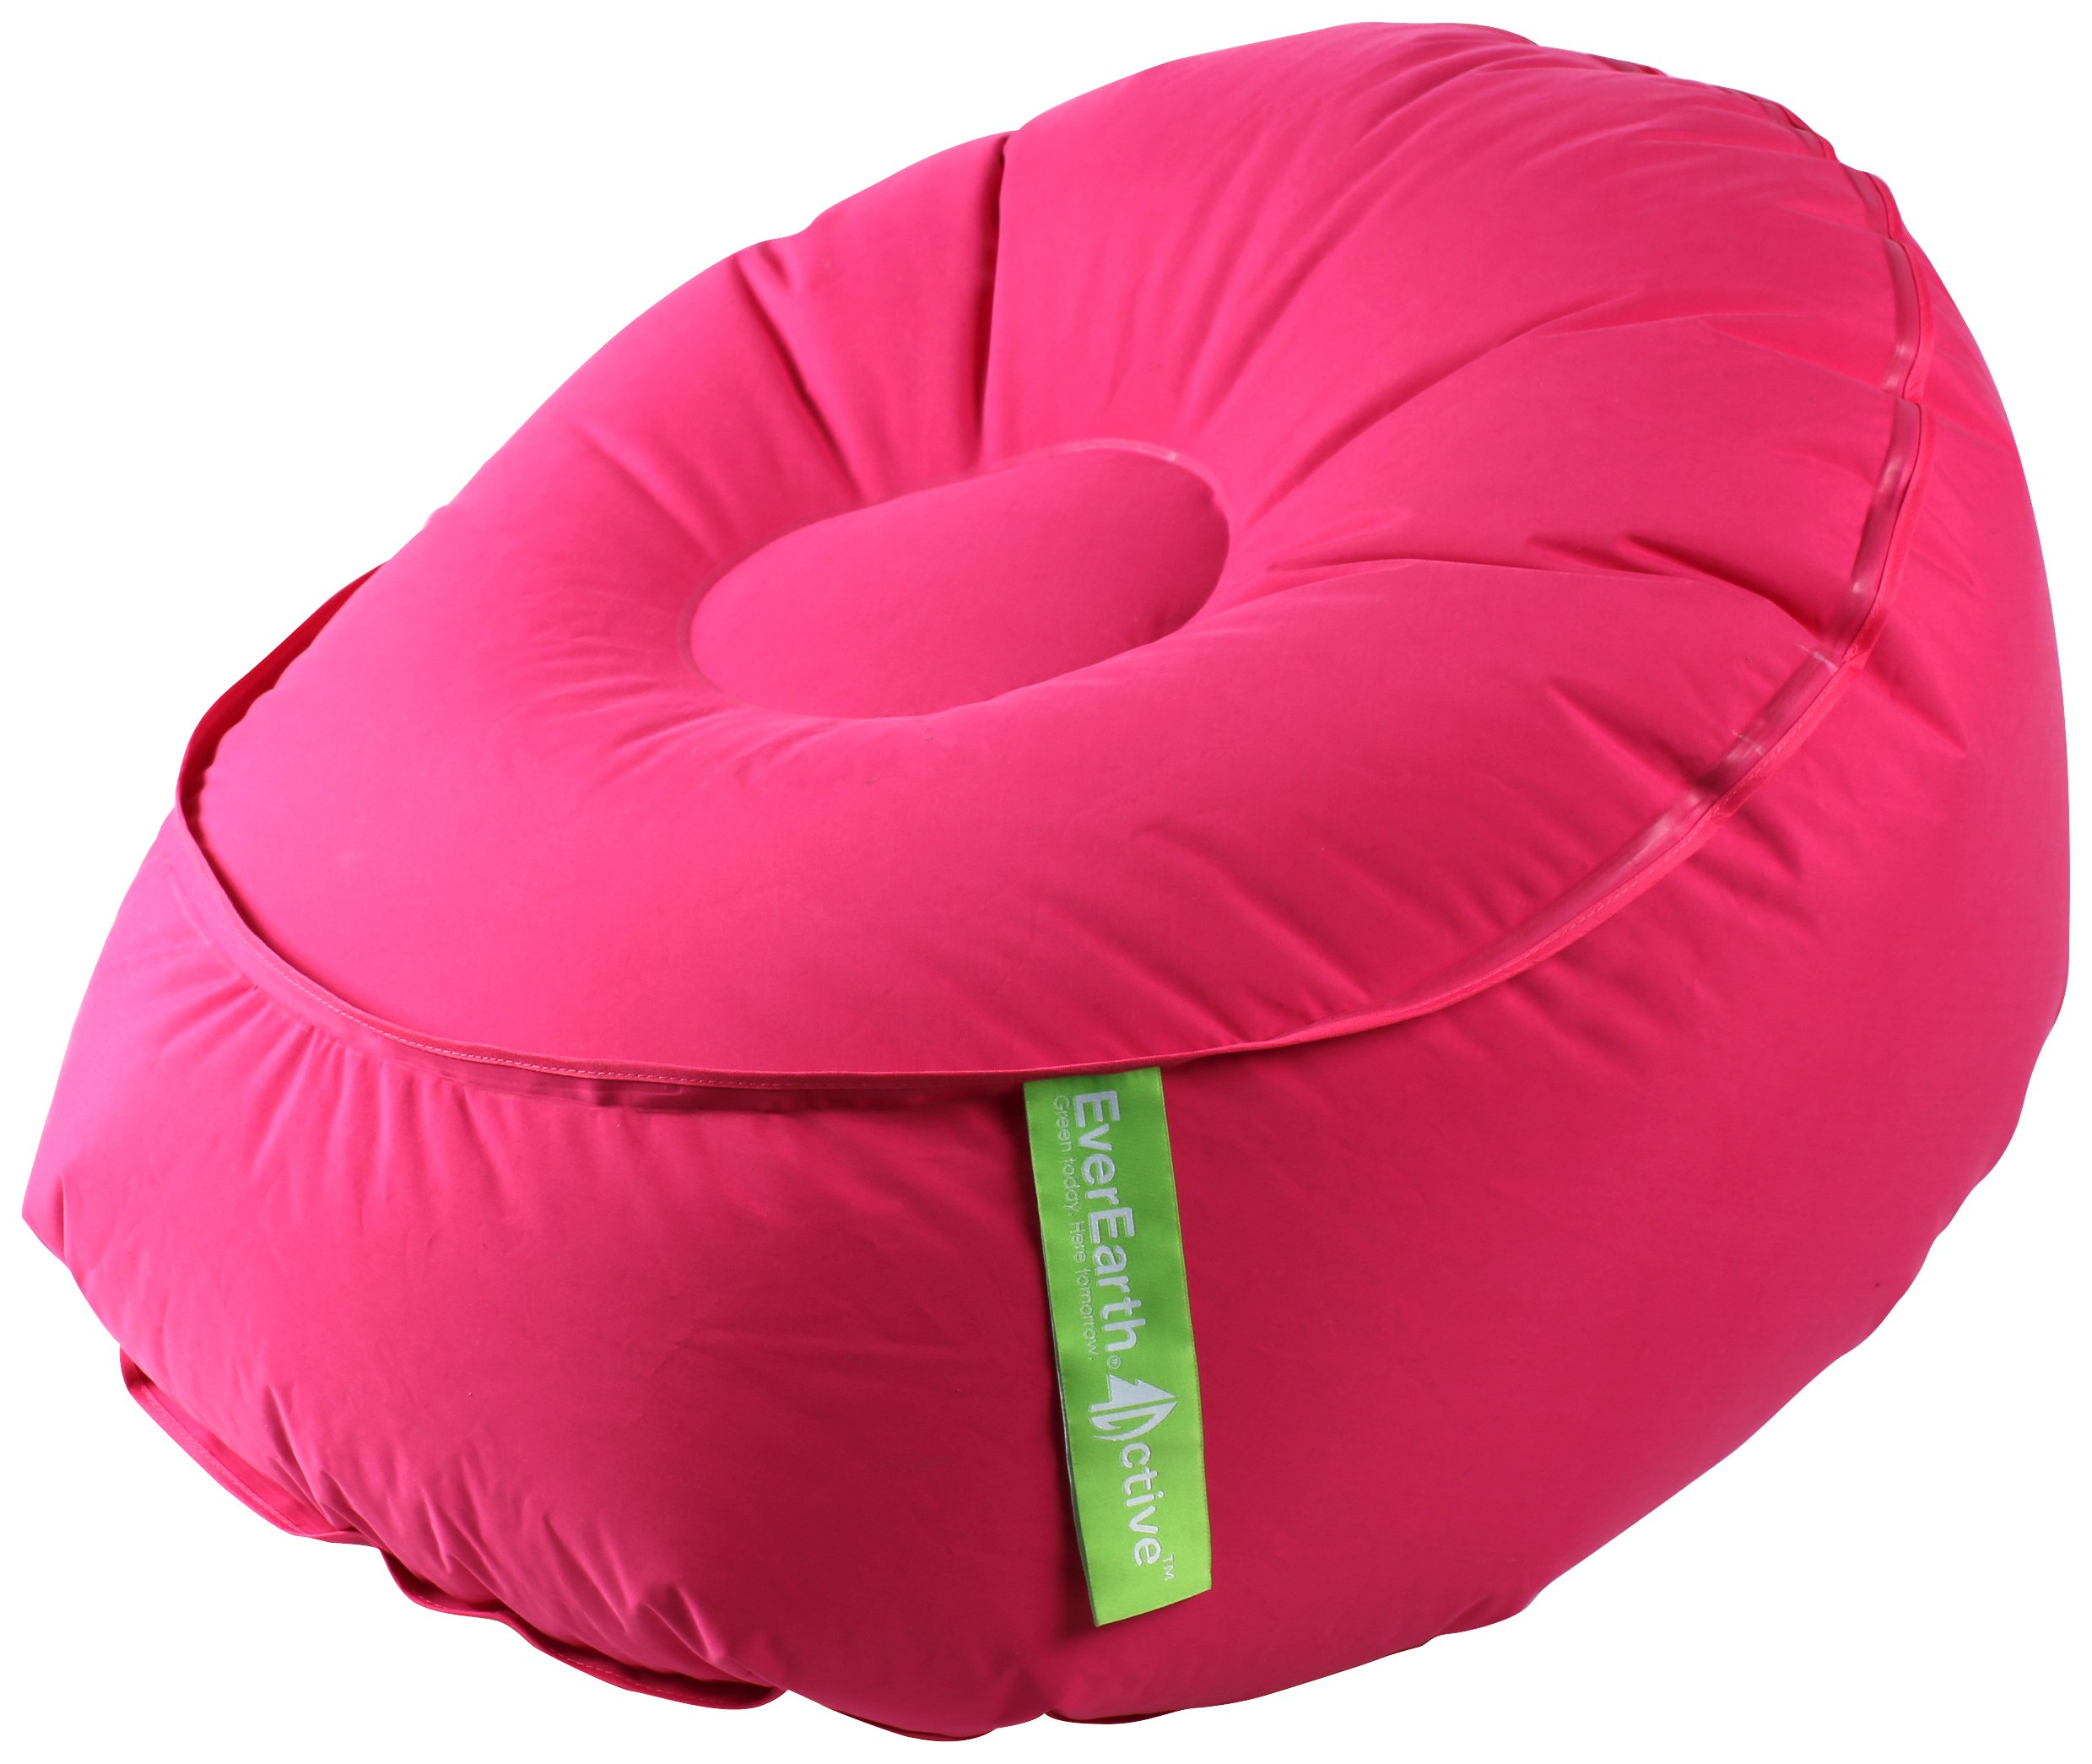 EverEarth Ezair Rangi Inflatable Chair, pink